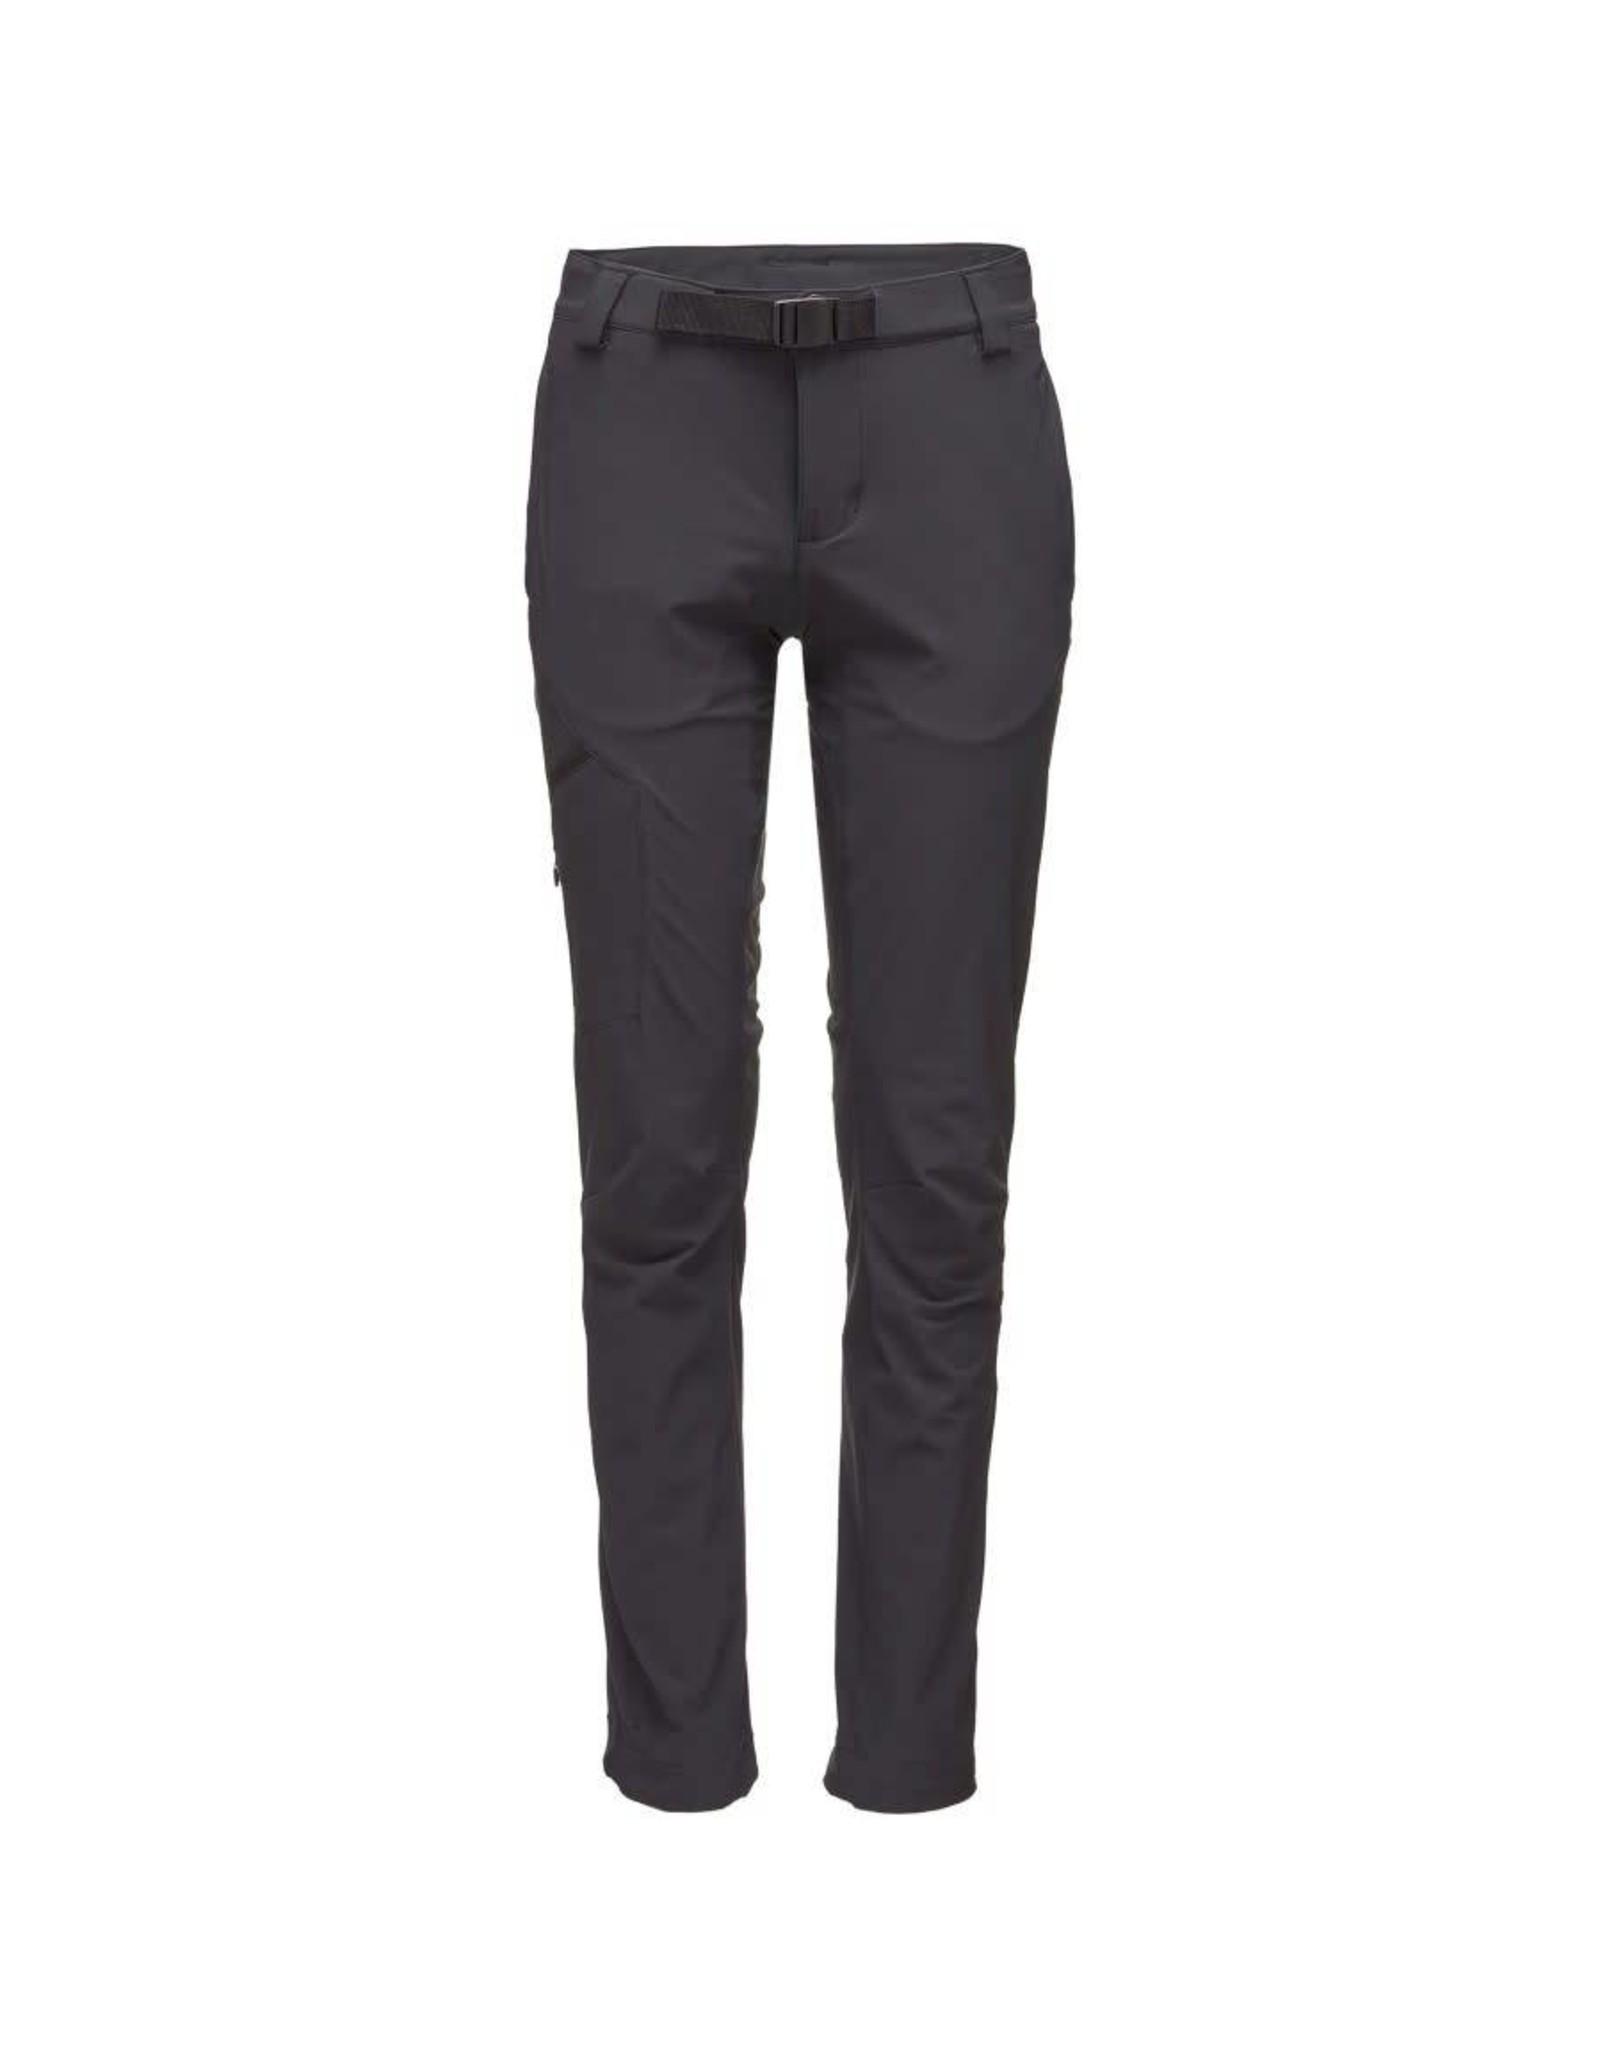 Black Diamond Black Diamond Women's Alpine Pants